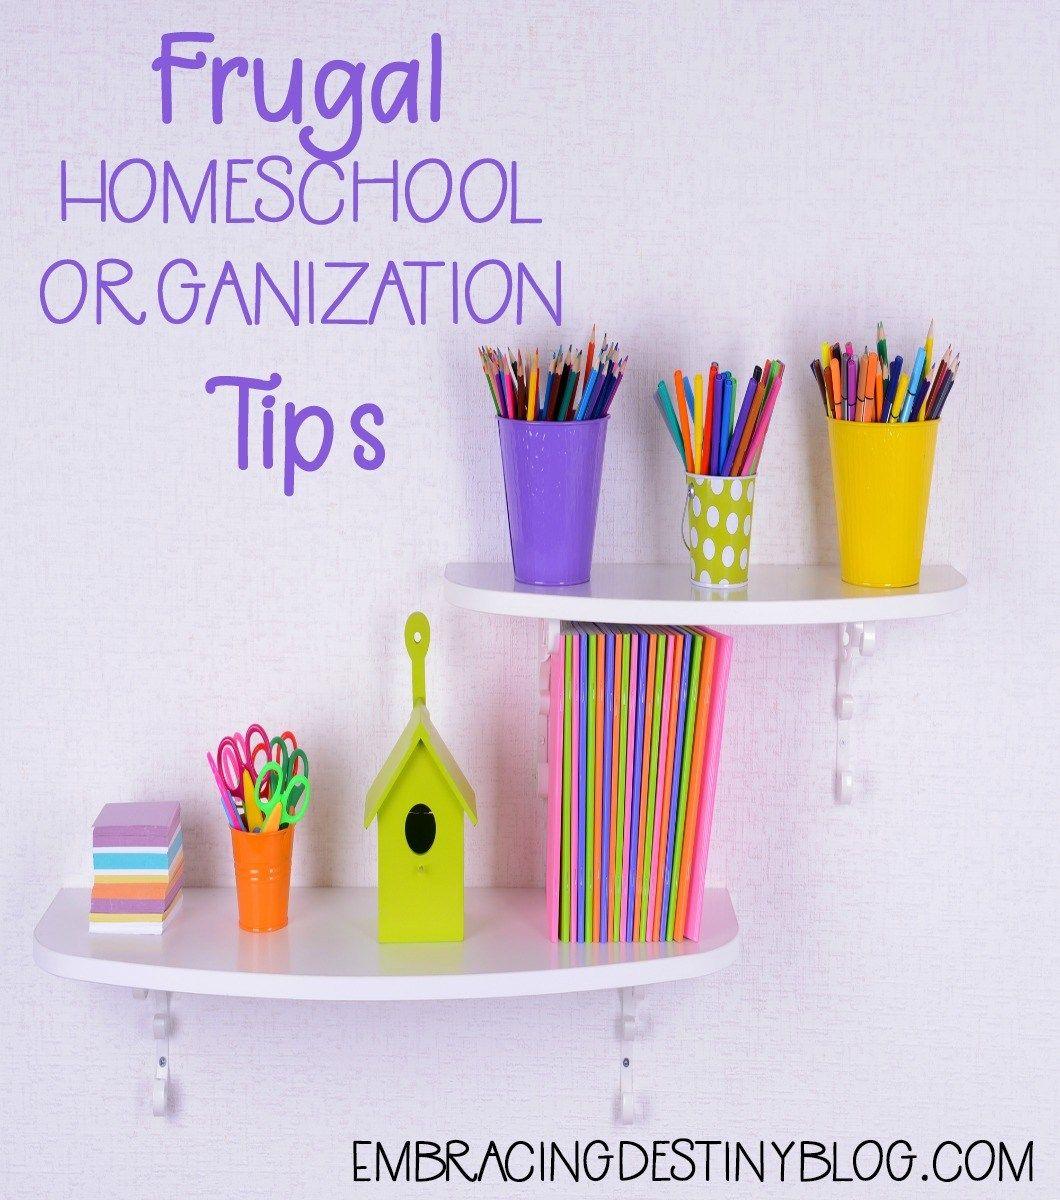 Frugal Homeschool Organization Tips Using Dollar Tree Supplies Heart And Soul Homeschooling Homeschool Organization School Hacks Organizations Homeschool